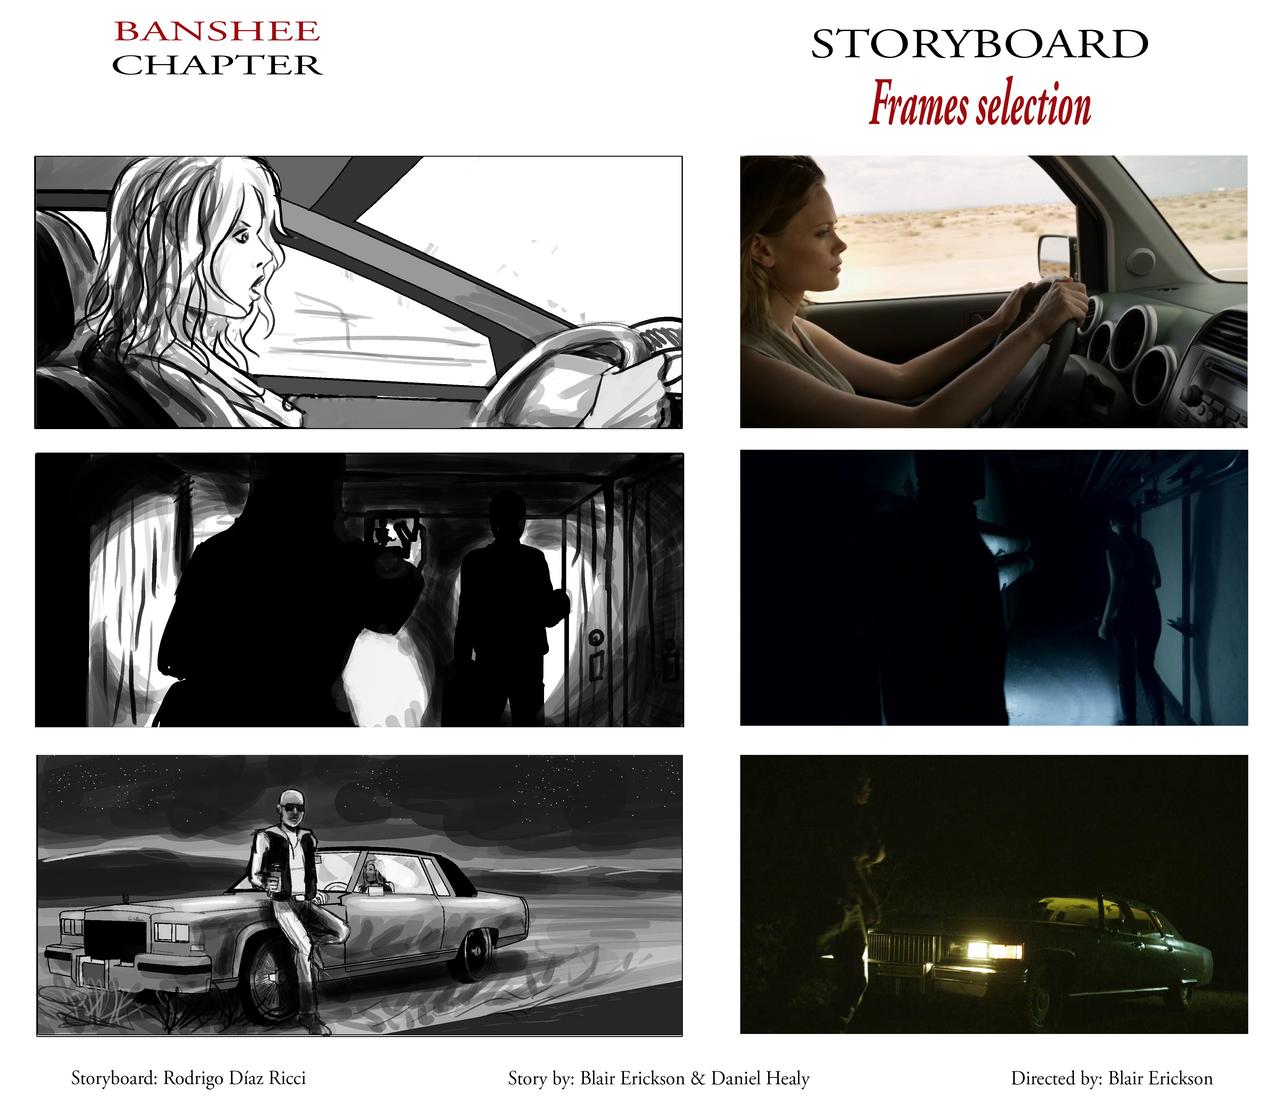 Banshee Chapter - Storyboard sample FRAMES by rdricci